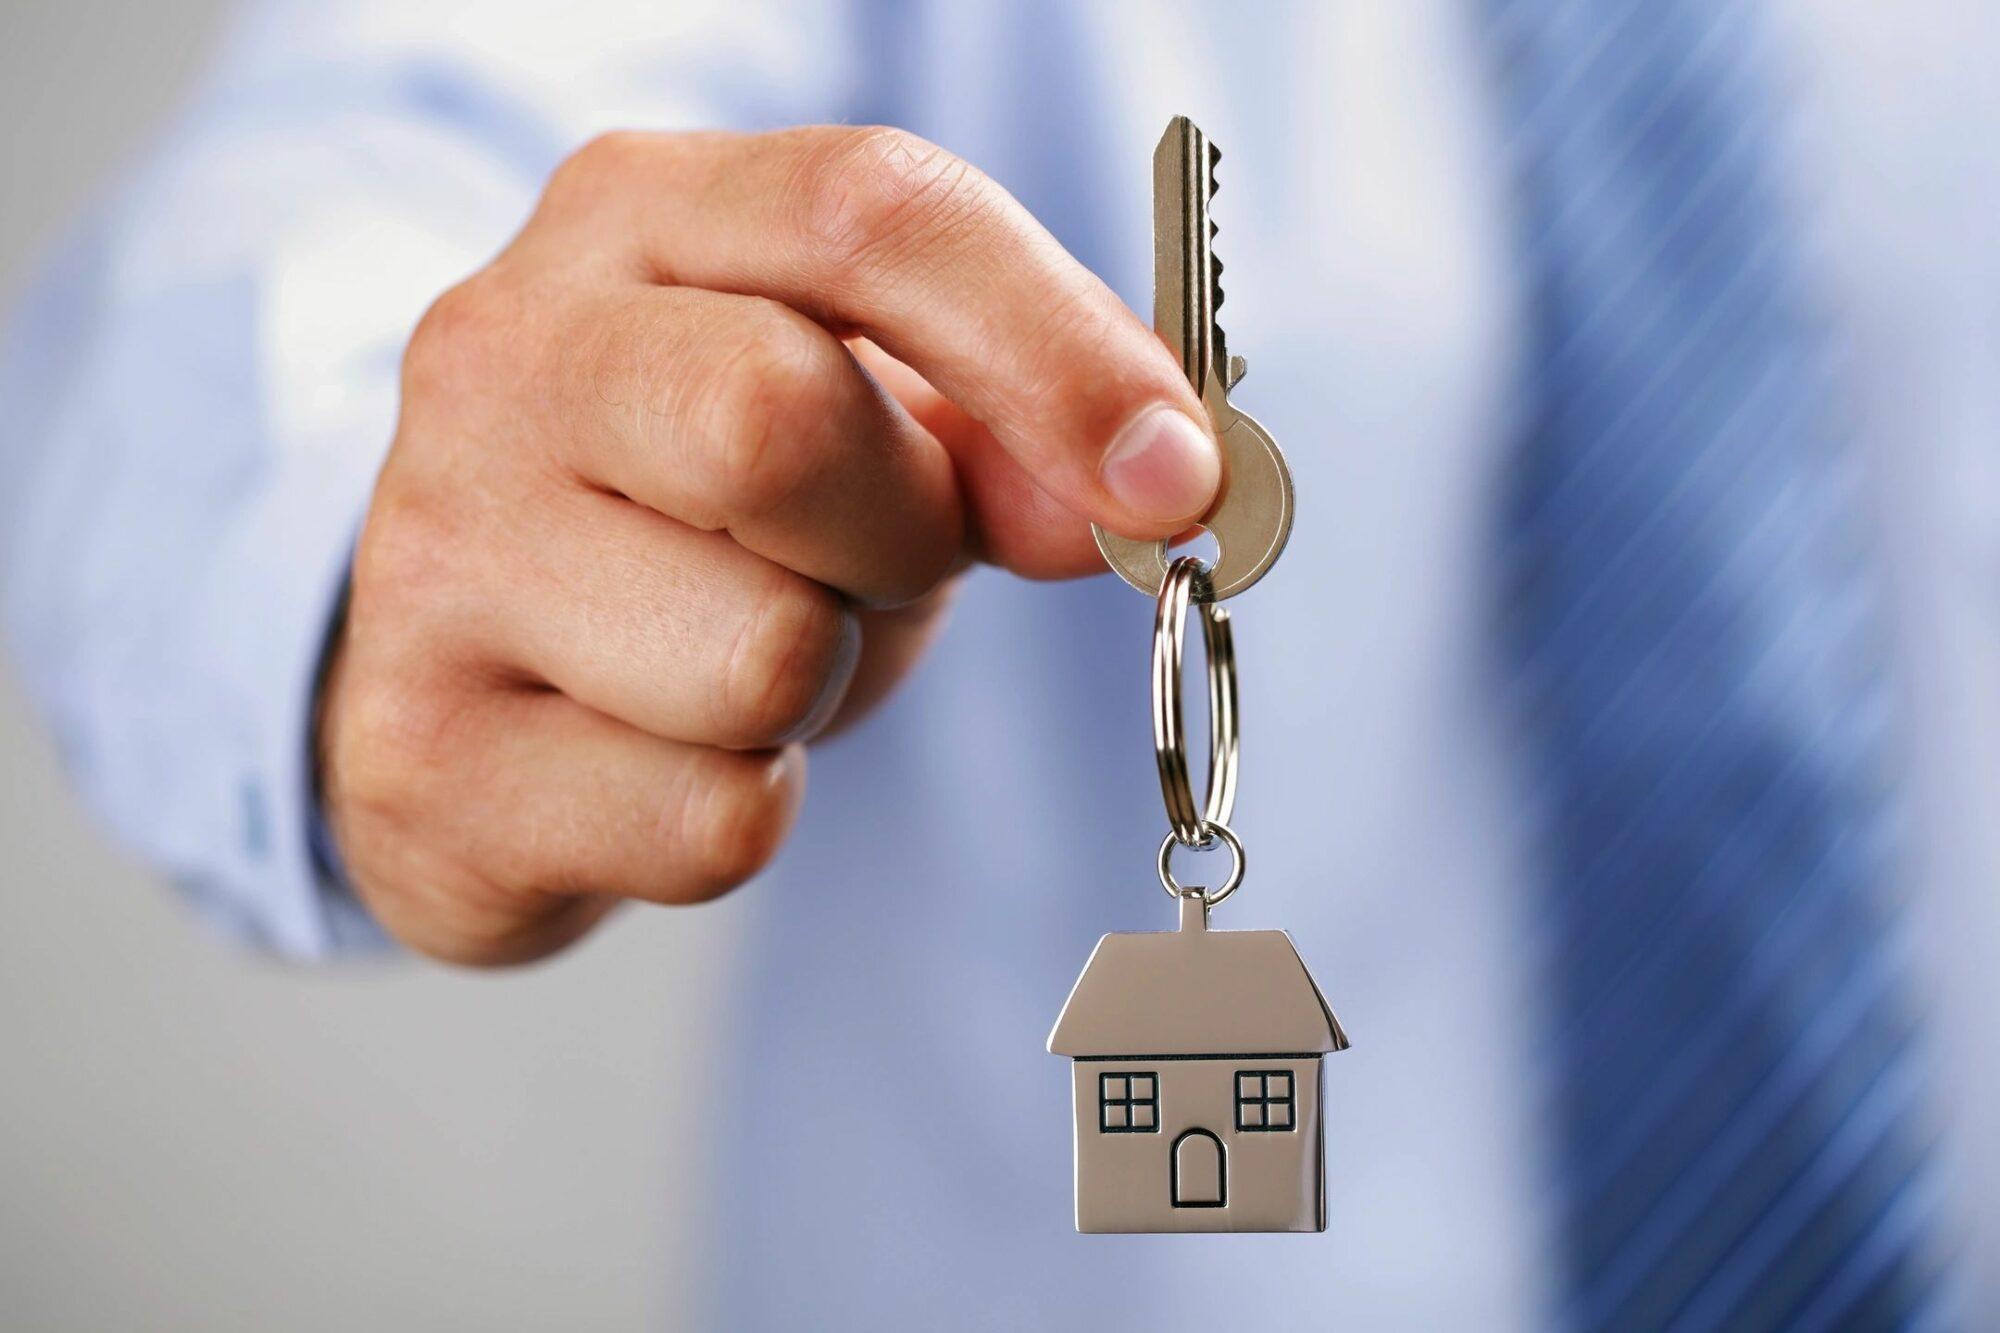 Bill Bodouva Jr. Real Estate Manhasset, Port Washington, NY. Seller / Buyer Agency ABR SRS | Call: 516.815.6600